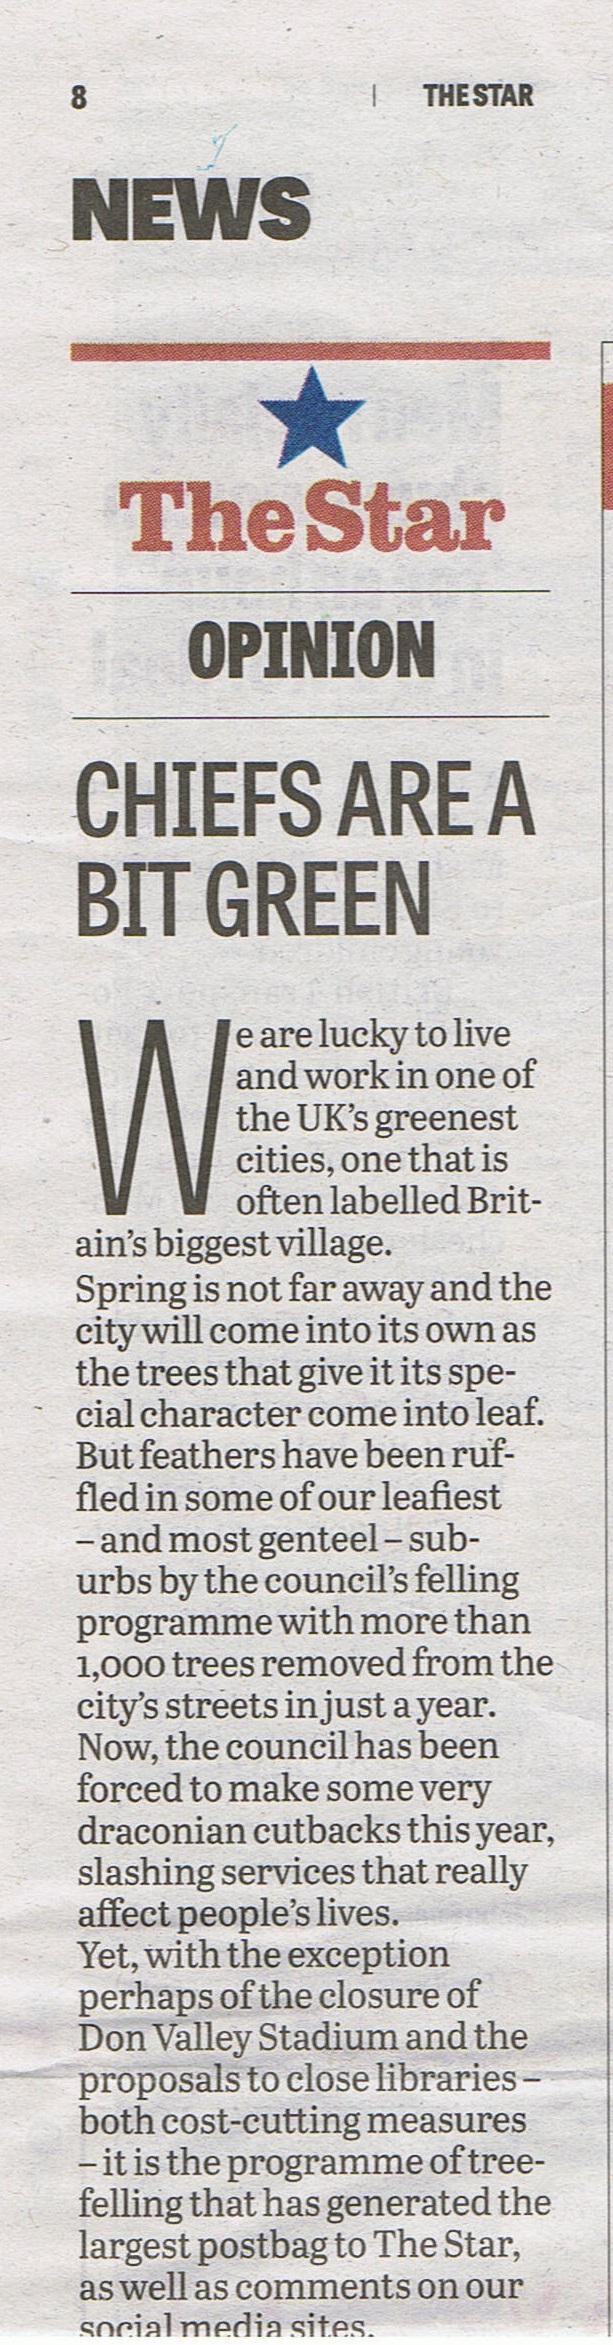 Sheffield Star Opinion January 18th 2014